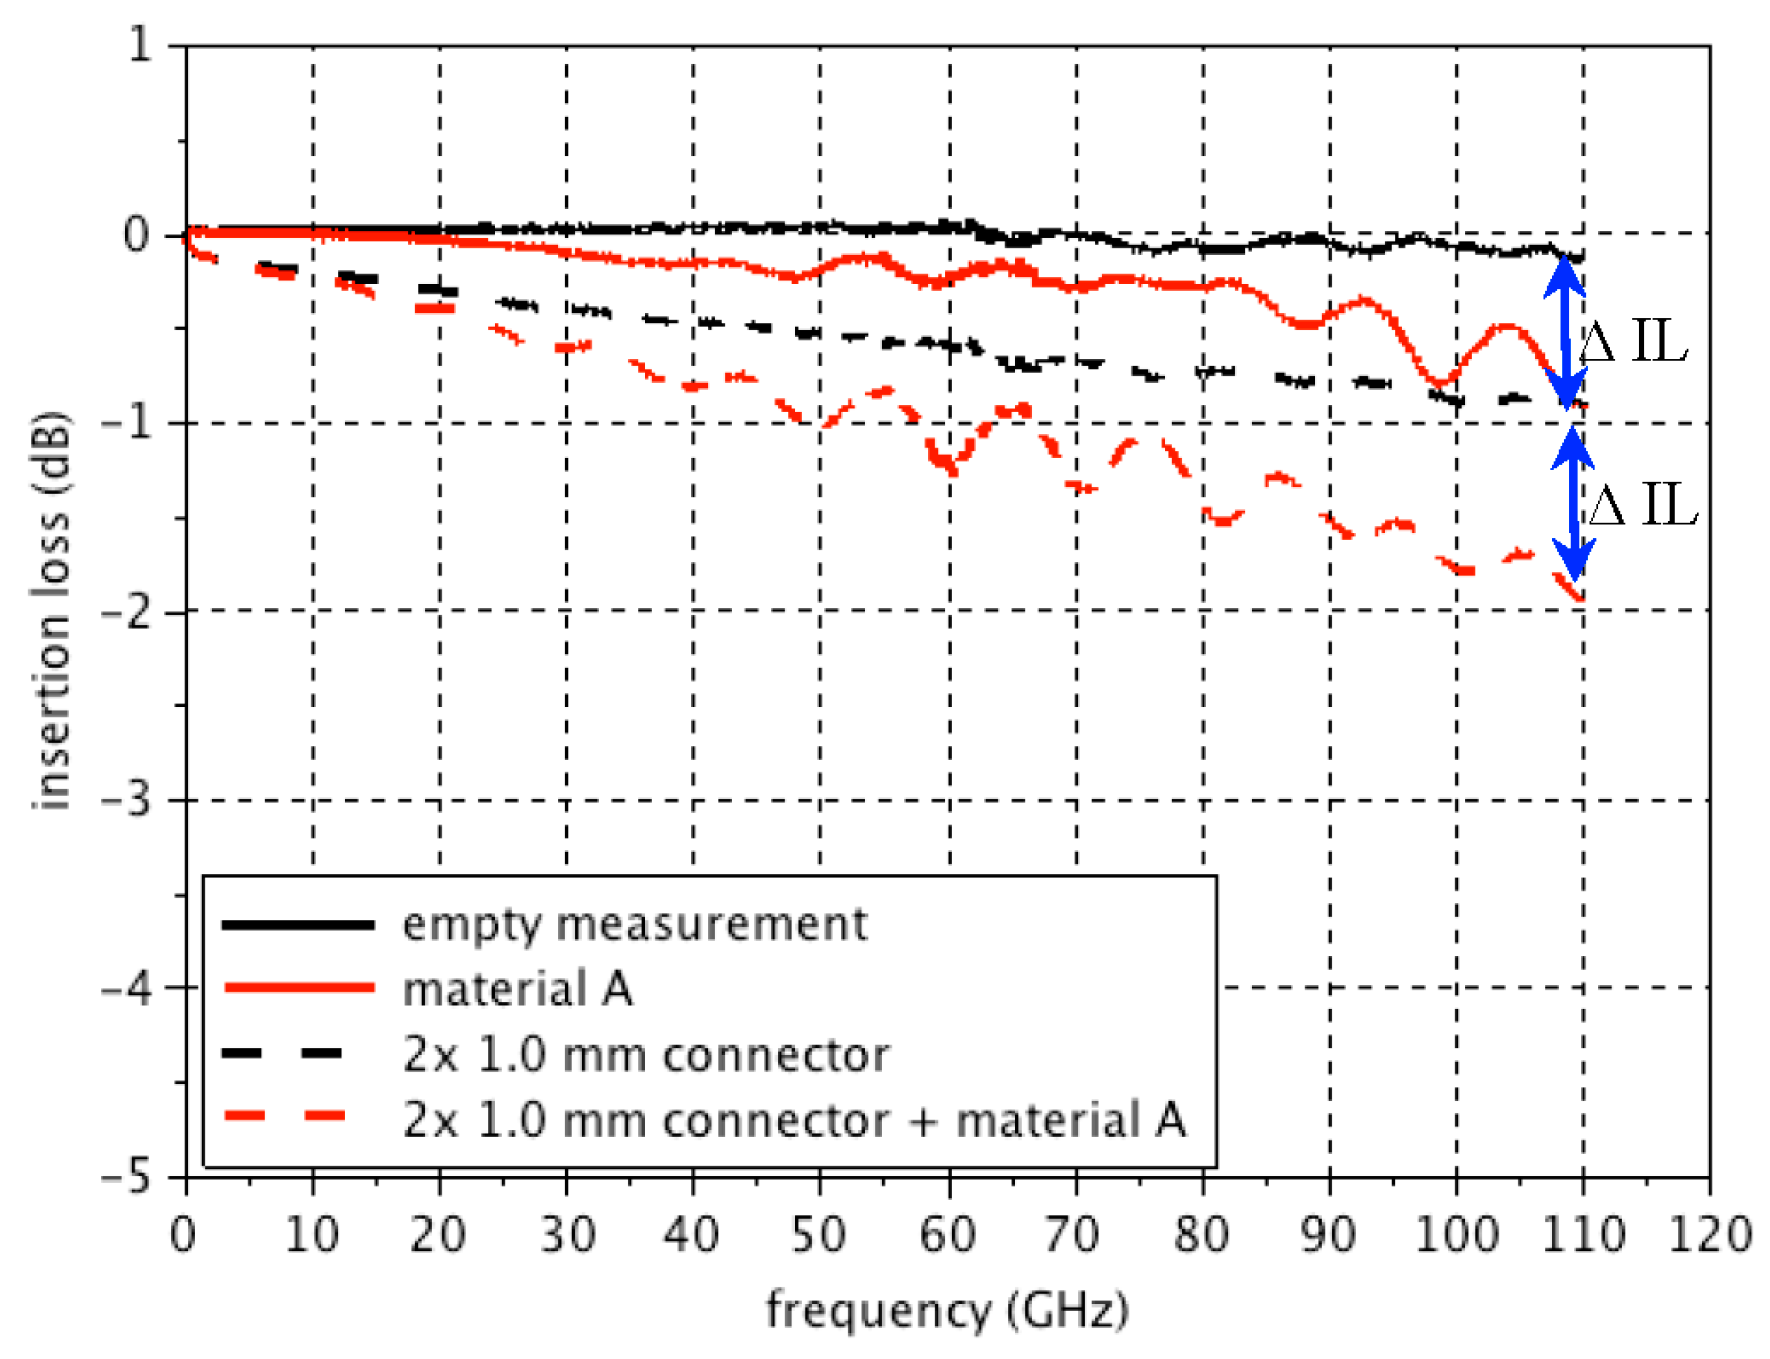 RUPPtronik - PariPoser bis 110GHz - electronics 06-00109-g007